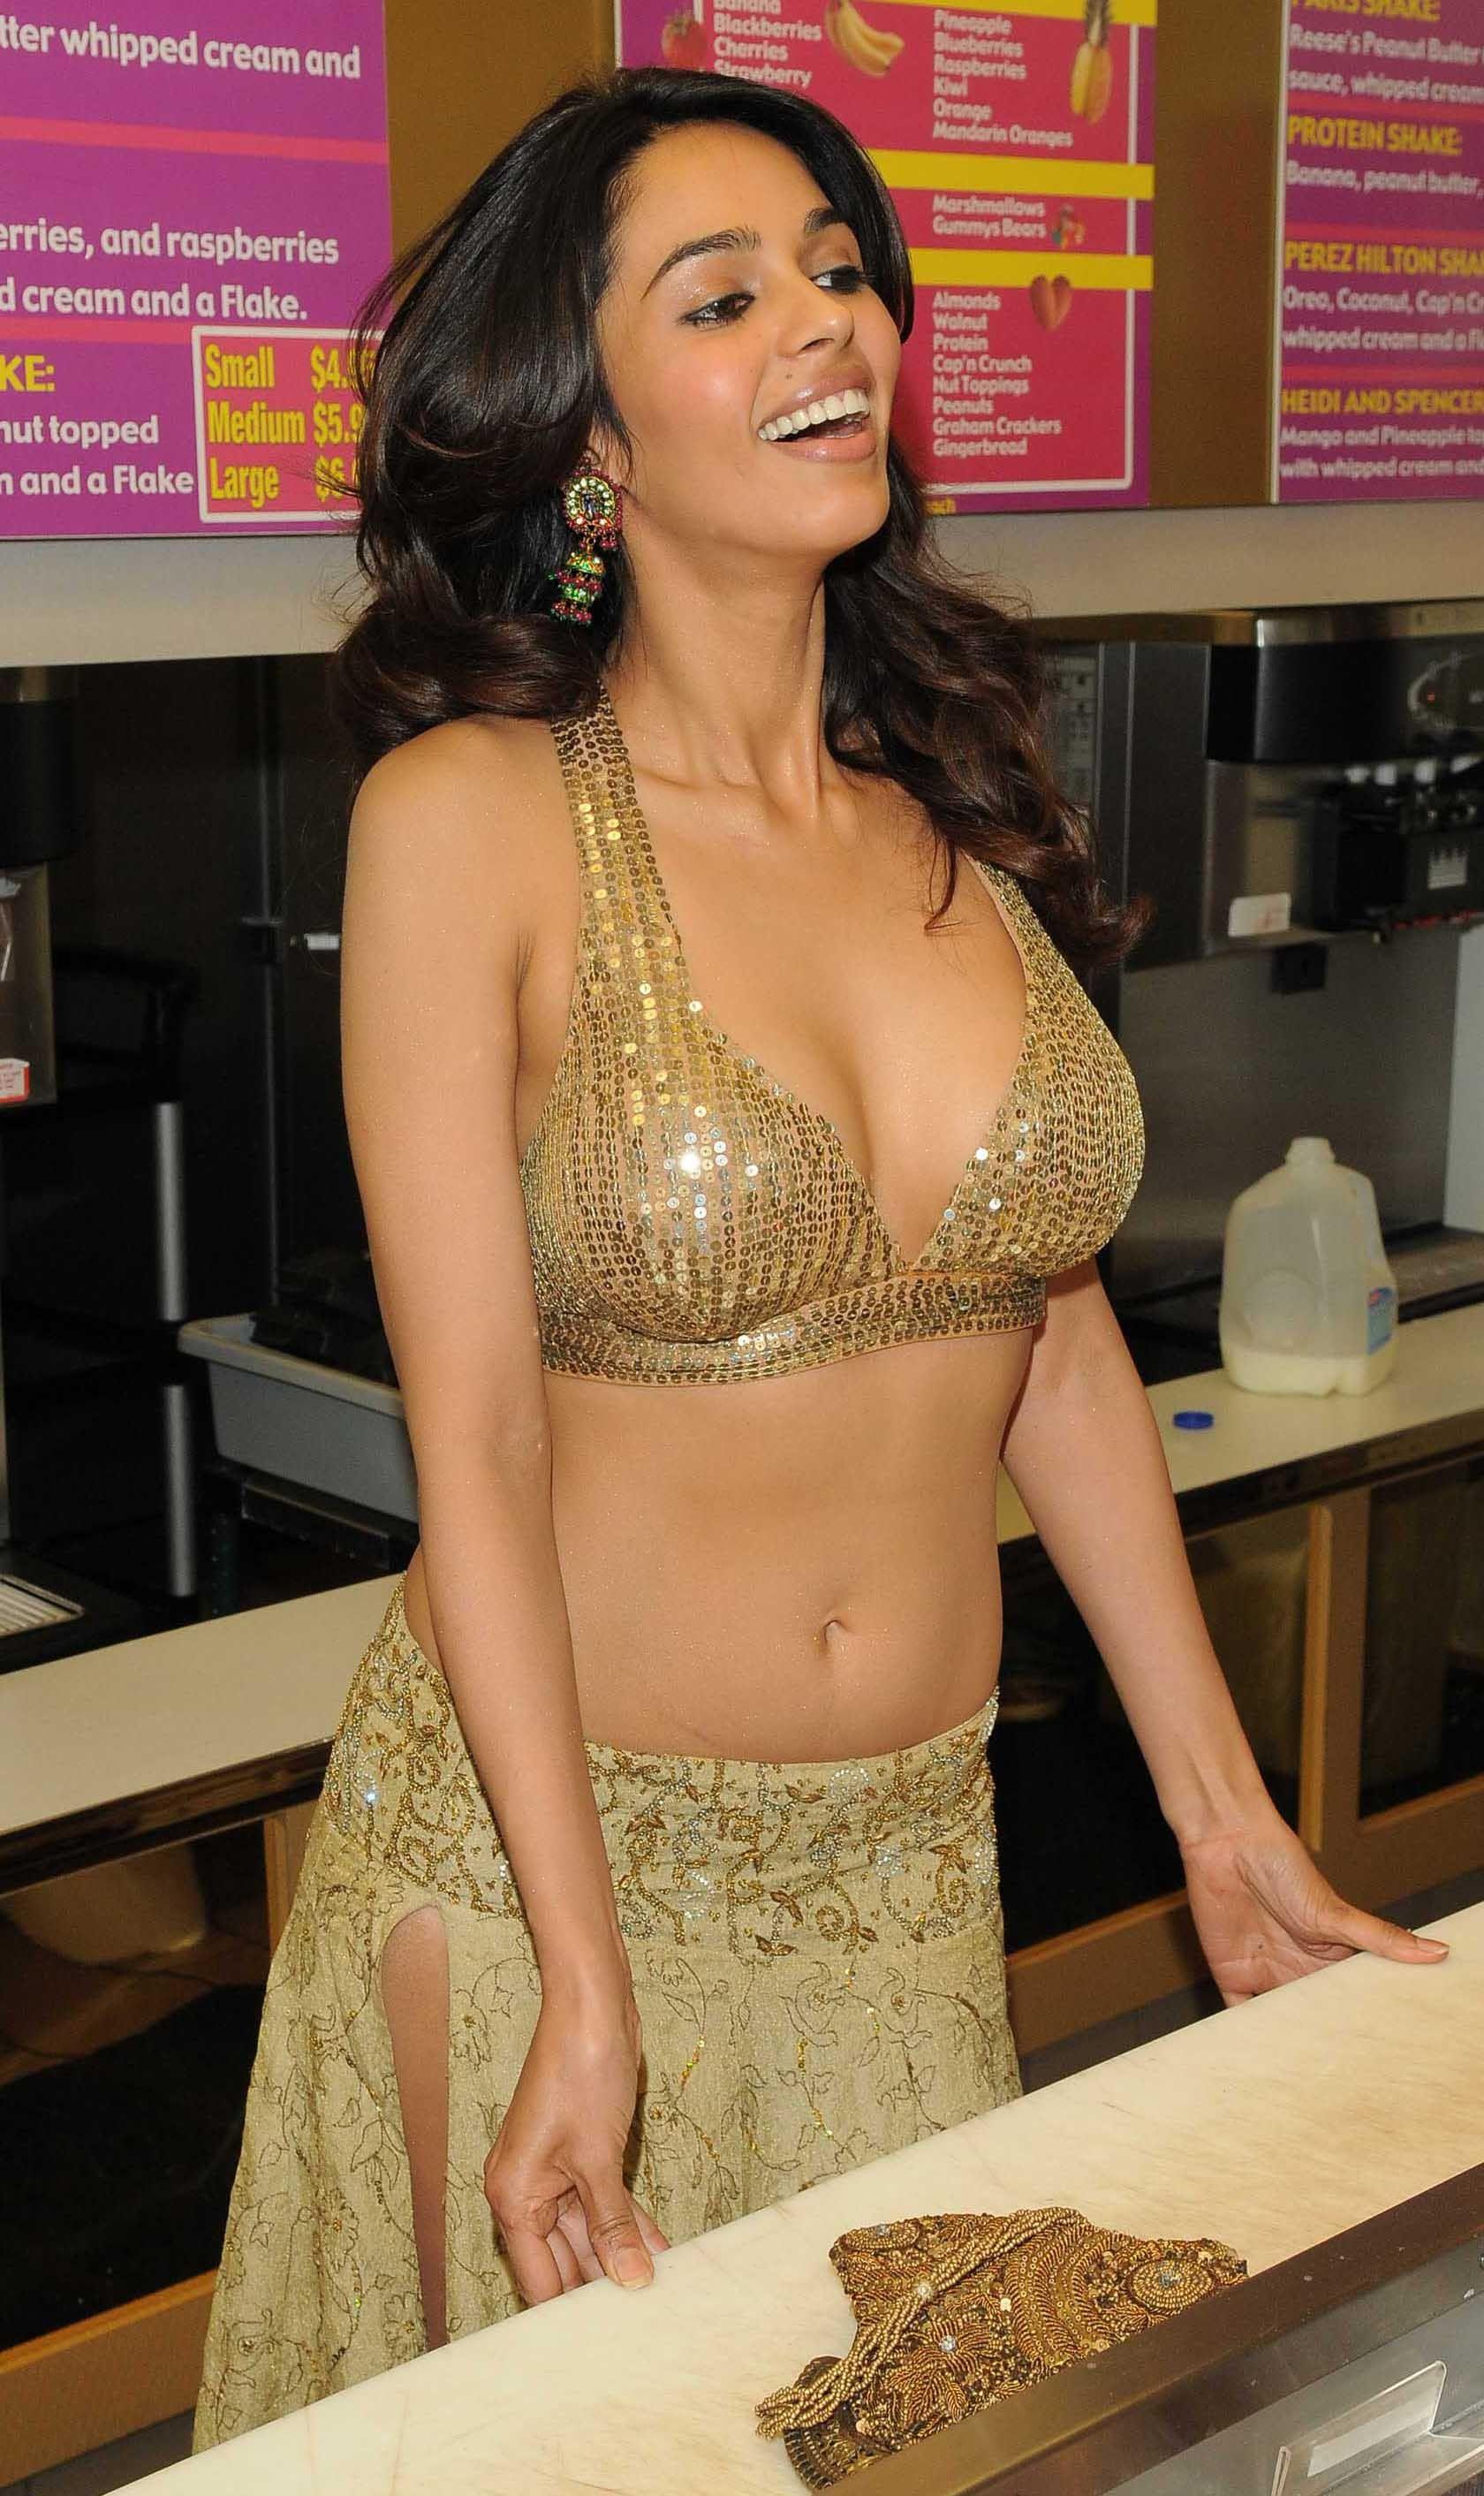 19 best malika images on pinterest | indian actresses, shake and